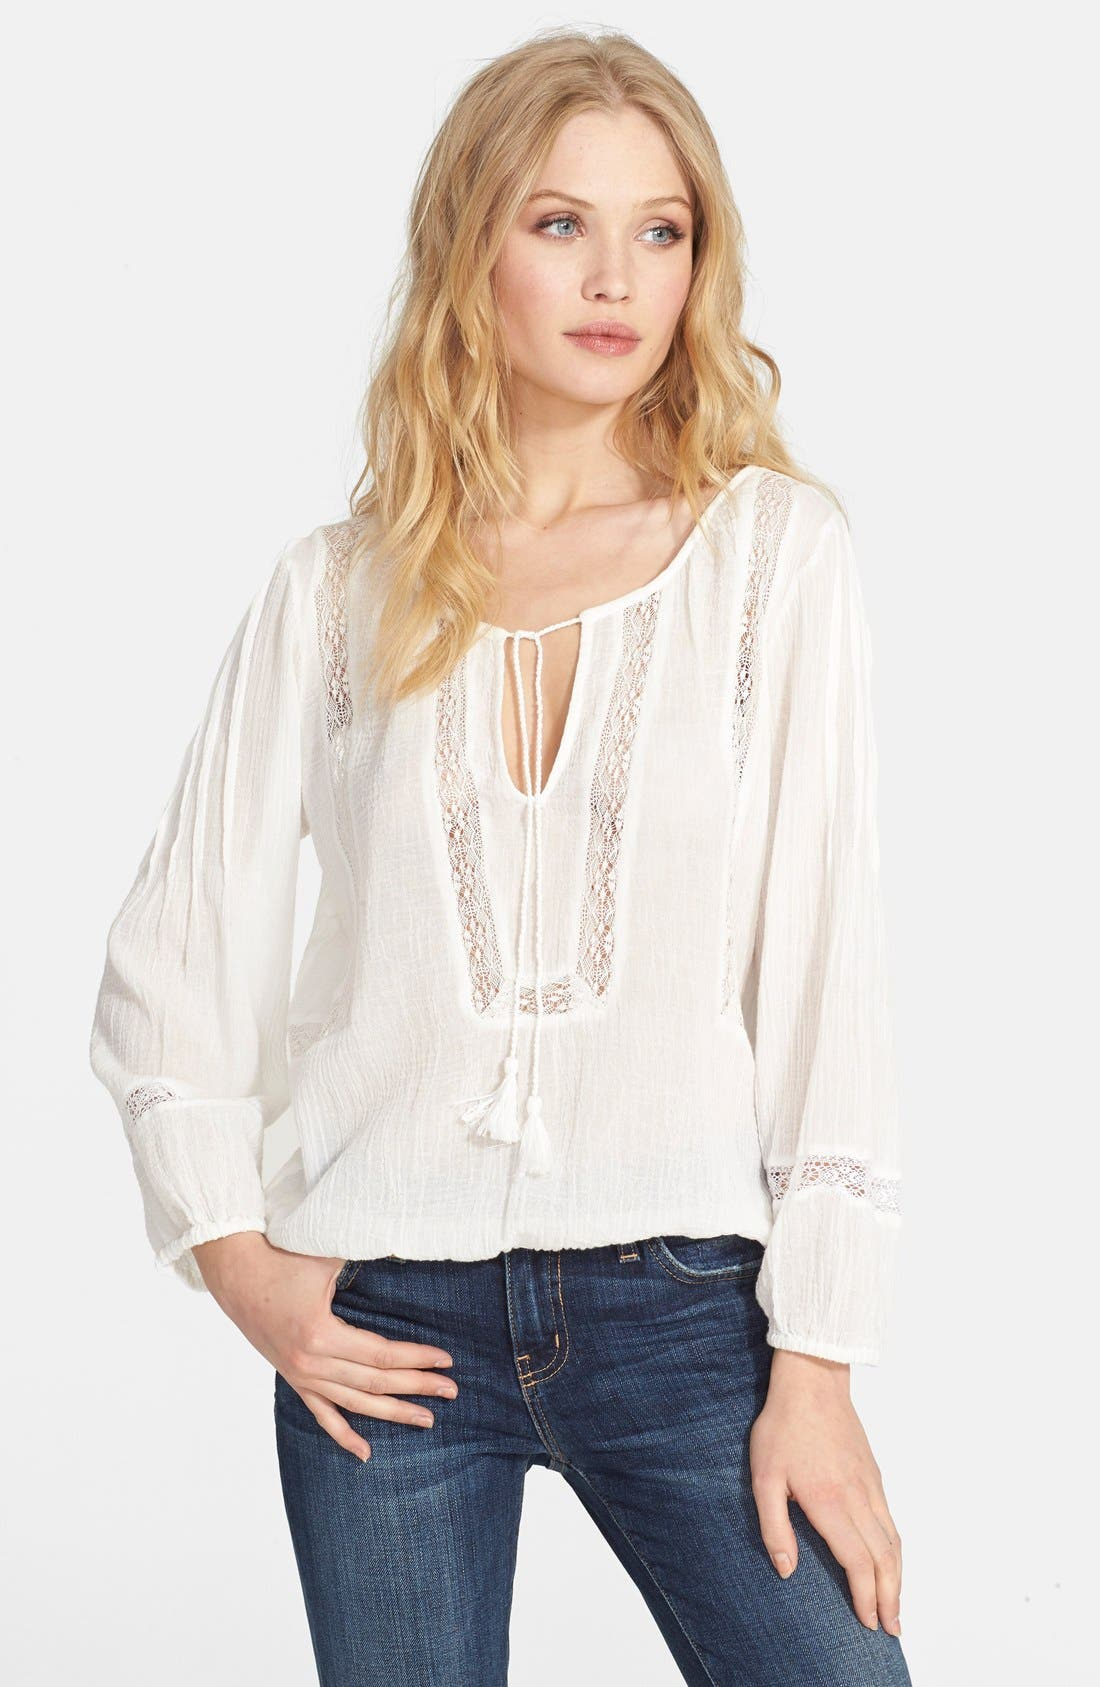 Main Image - Joie 'Arcene' Cotton Peasant Top